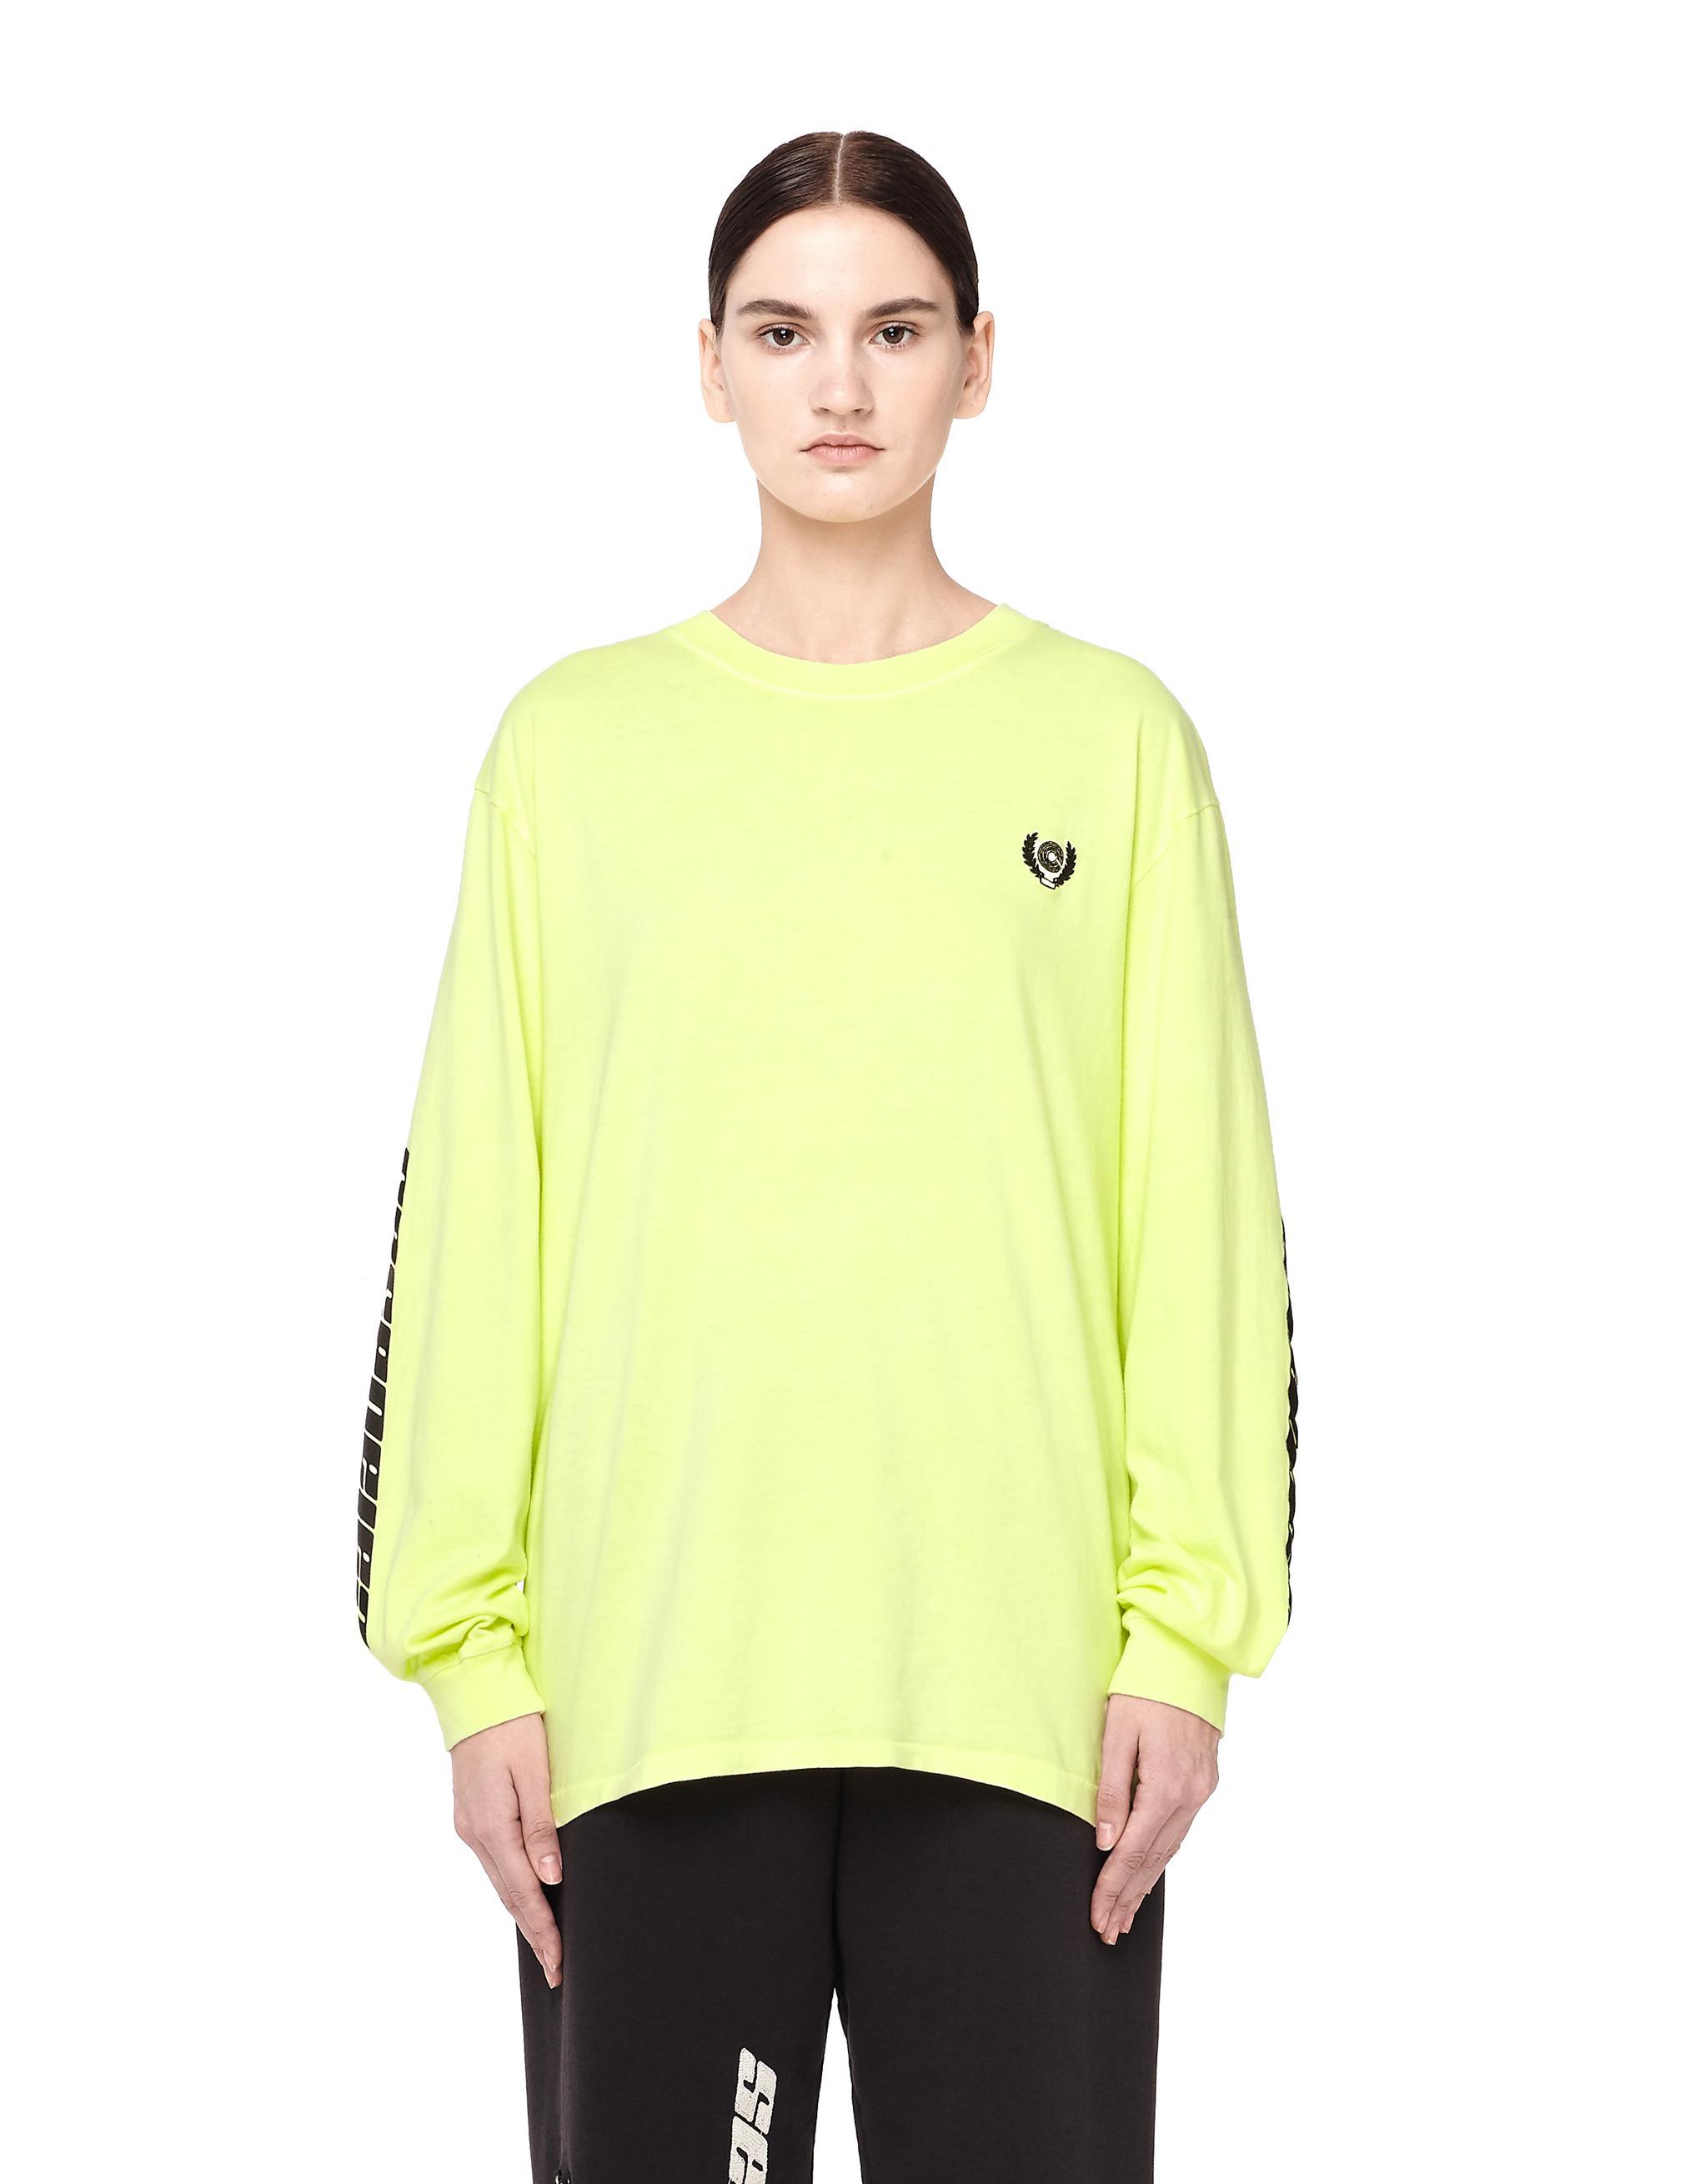 Lyst yeezy calabasas long sleeve t shirt in yellow for Womens yellow long sleeve shirt